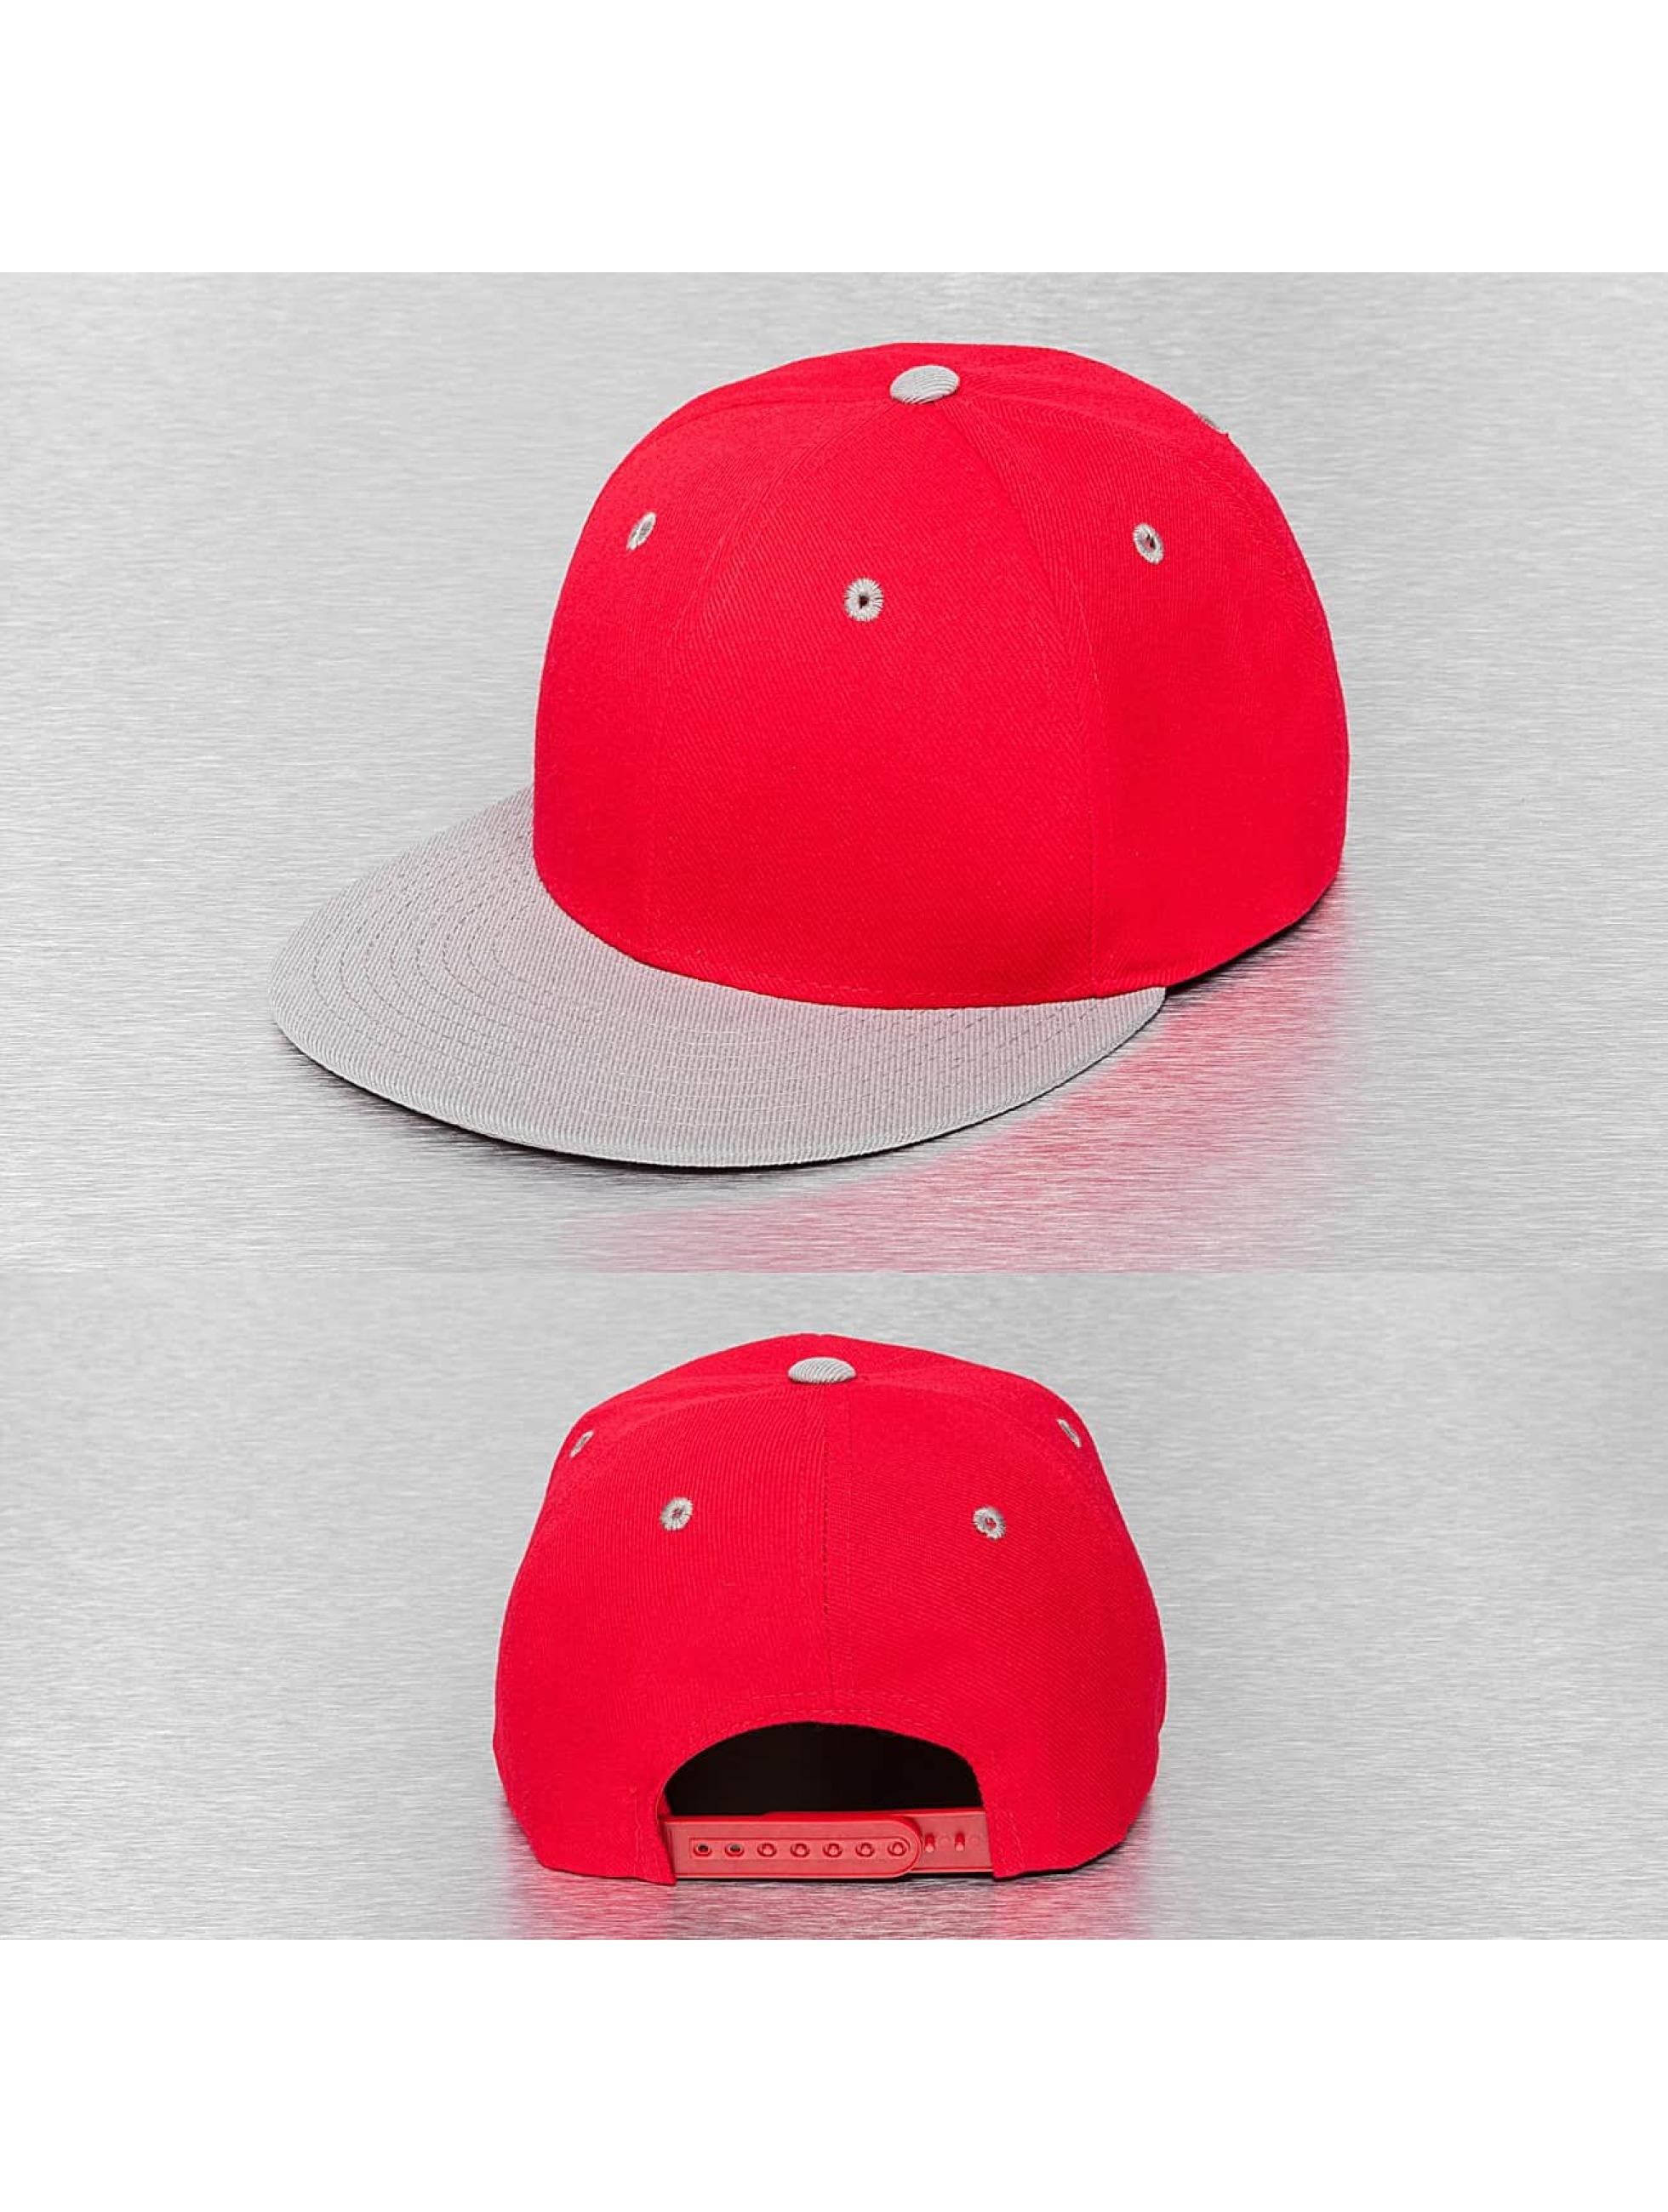 Cap Crony Männer,Frauen Snapback Cap Two Tone Flat Bill in rot